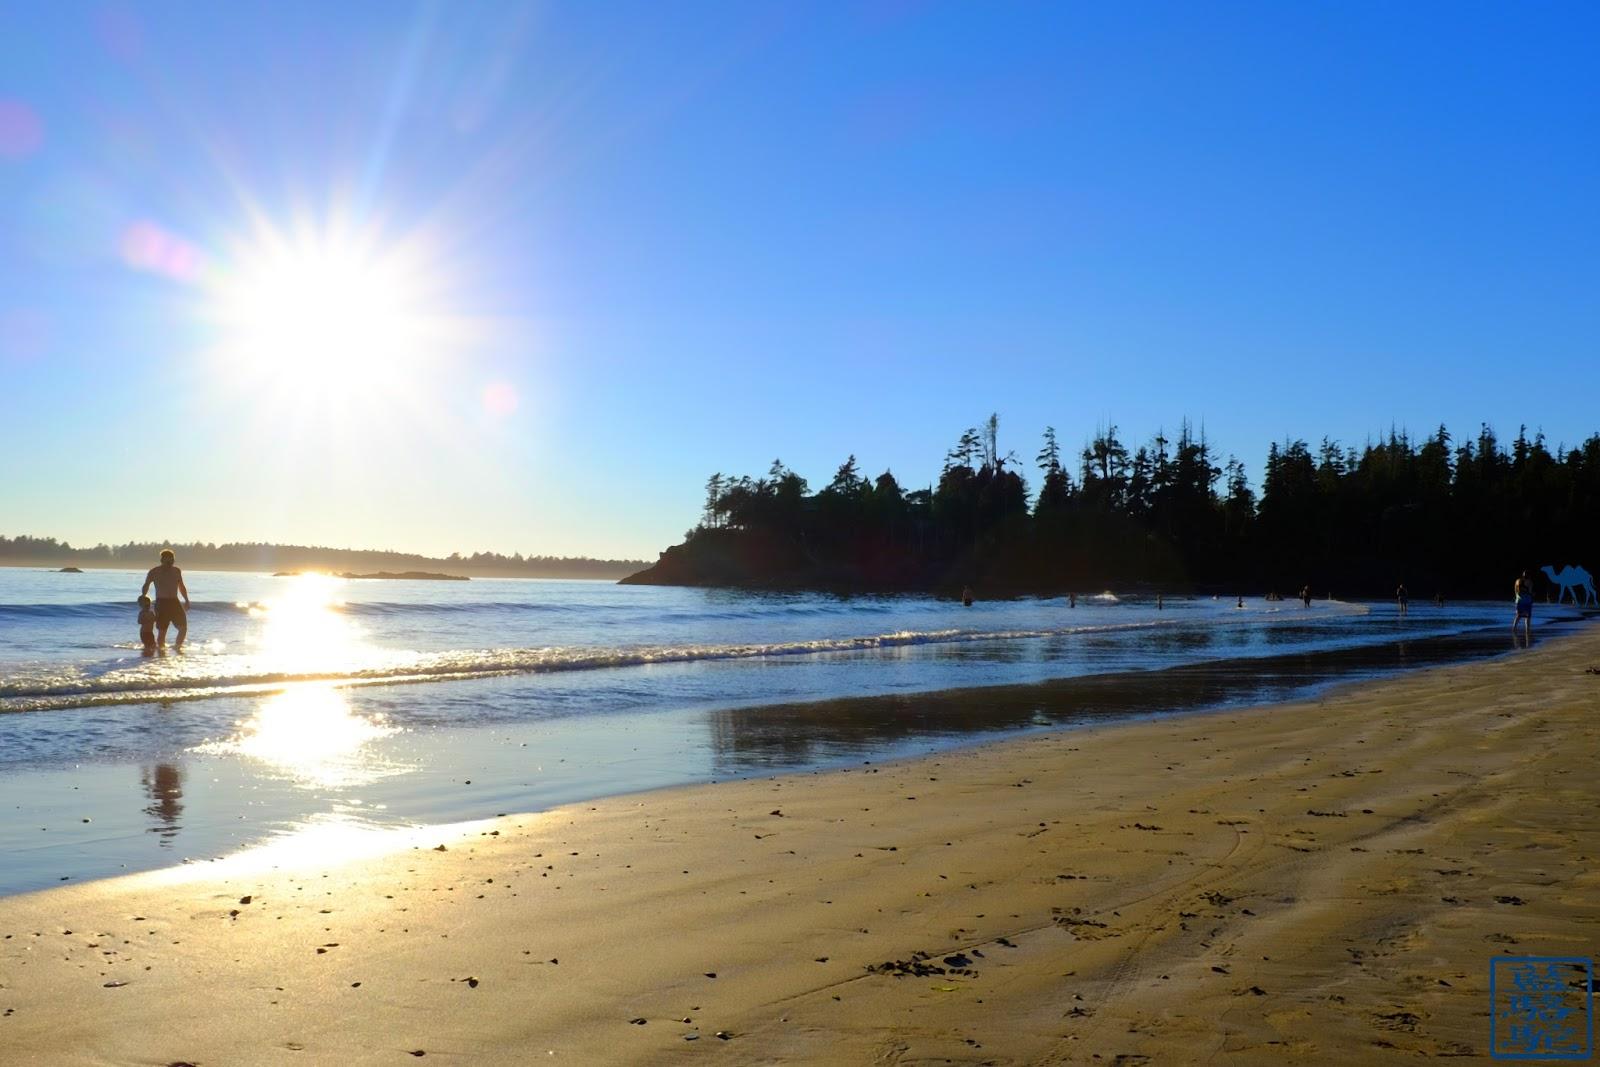 Le Chameau bleu - Mackenzie Beach - Tofino